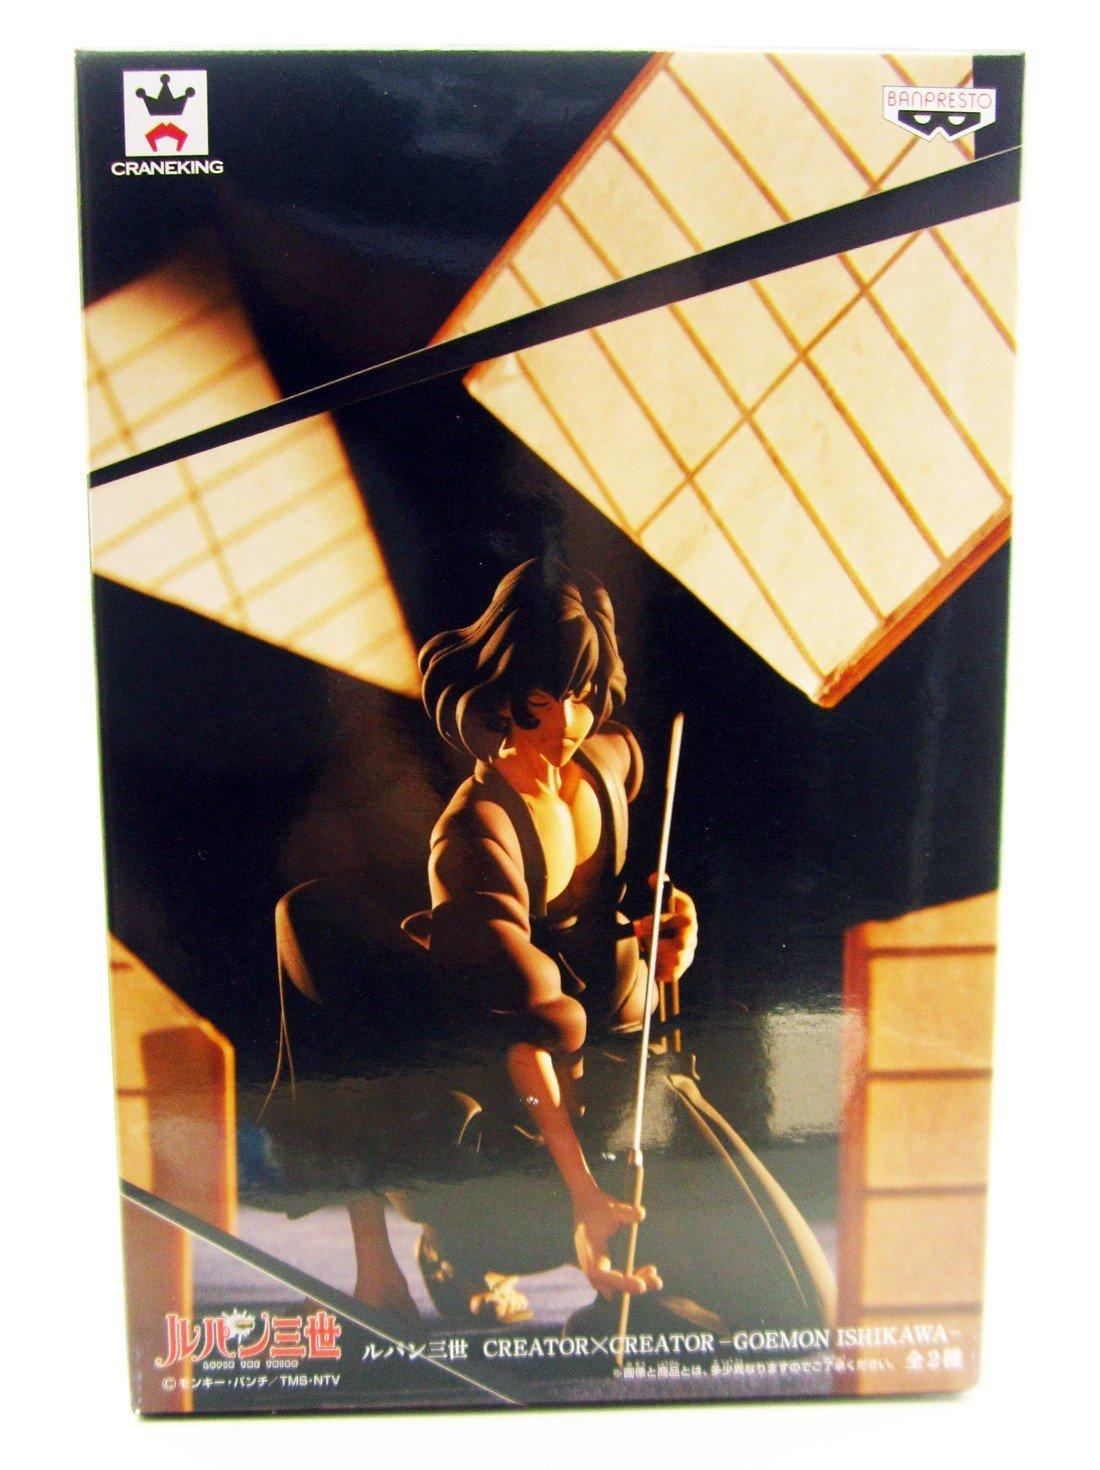 Lupine The 3rd CREATOR GOEMON ISHIKAWA Banprest Japan